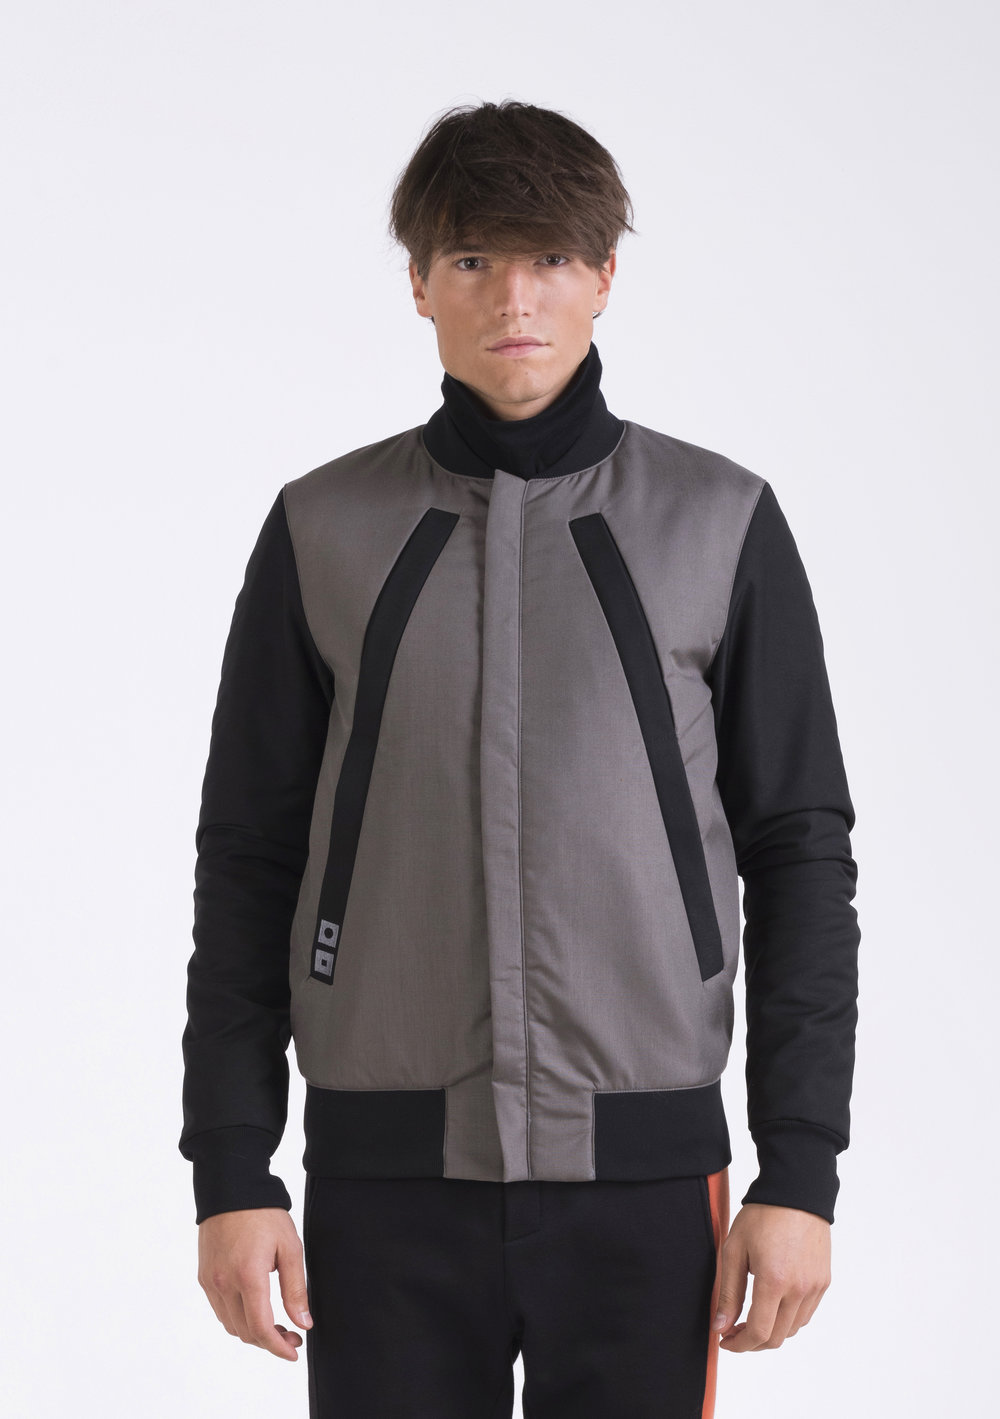 oneculture Bomber jacket grey 2.jpg